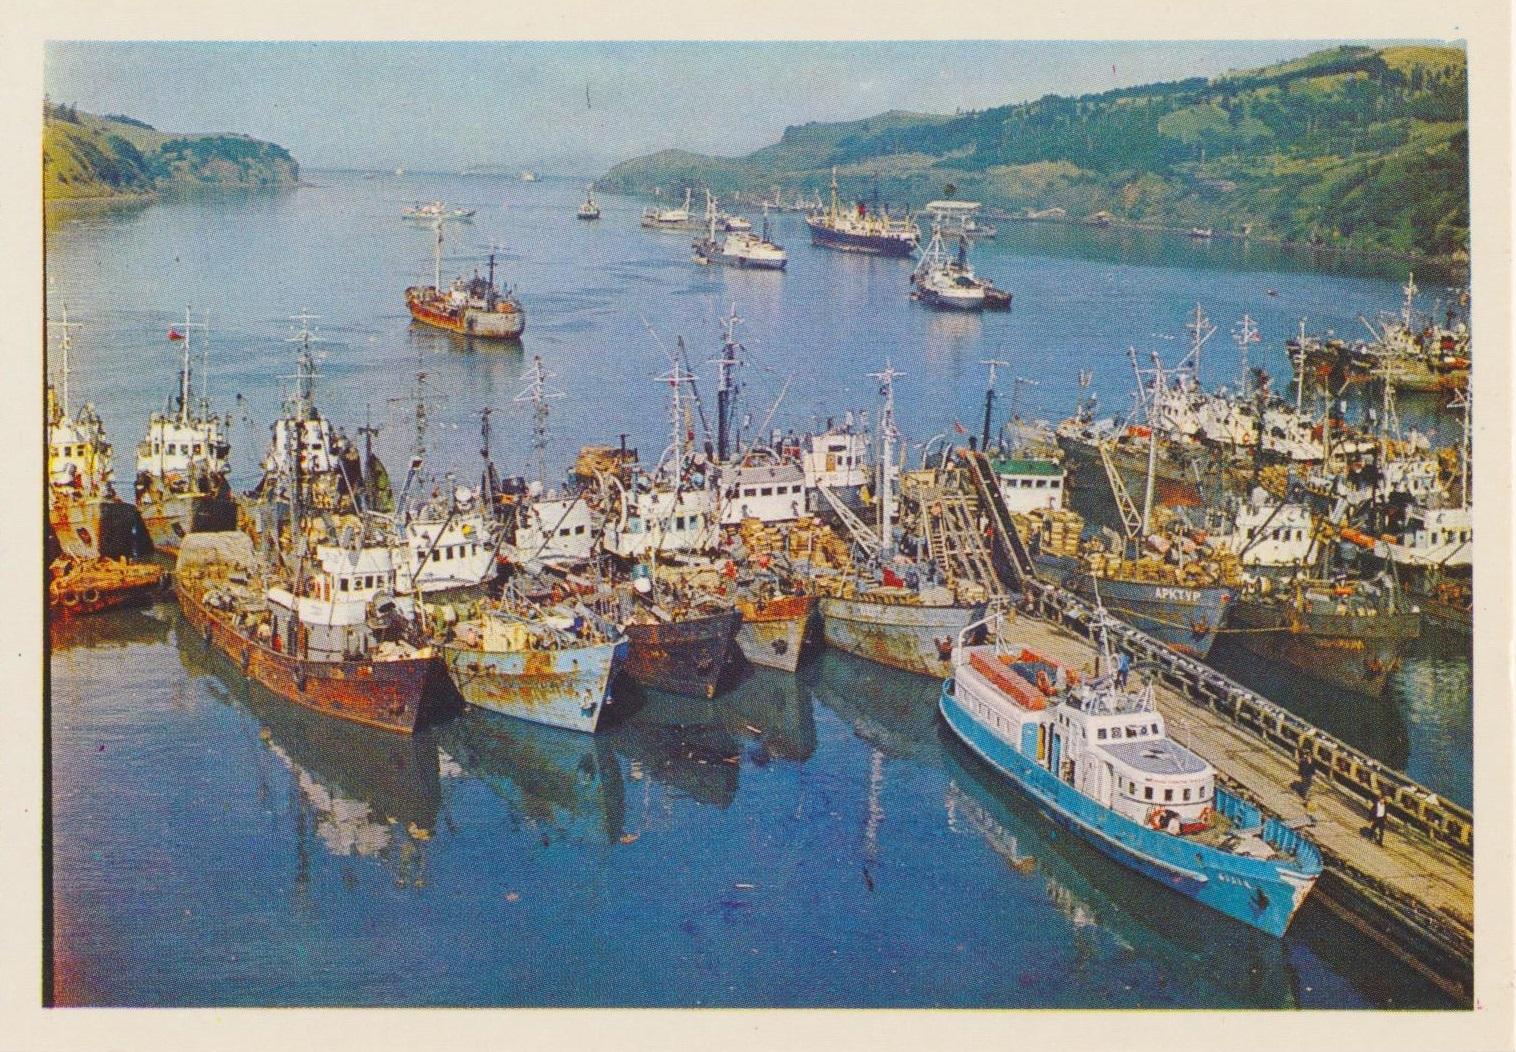 Рыболовецкая флотилия у острова Шикотан.